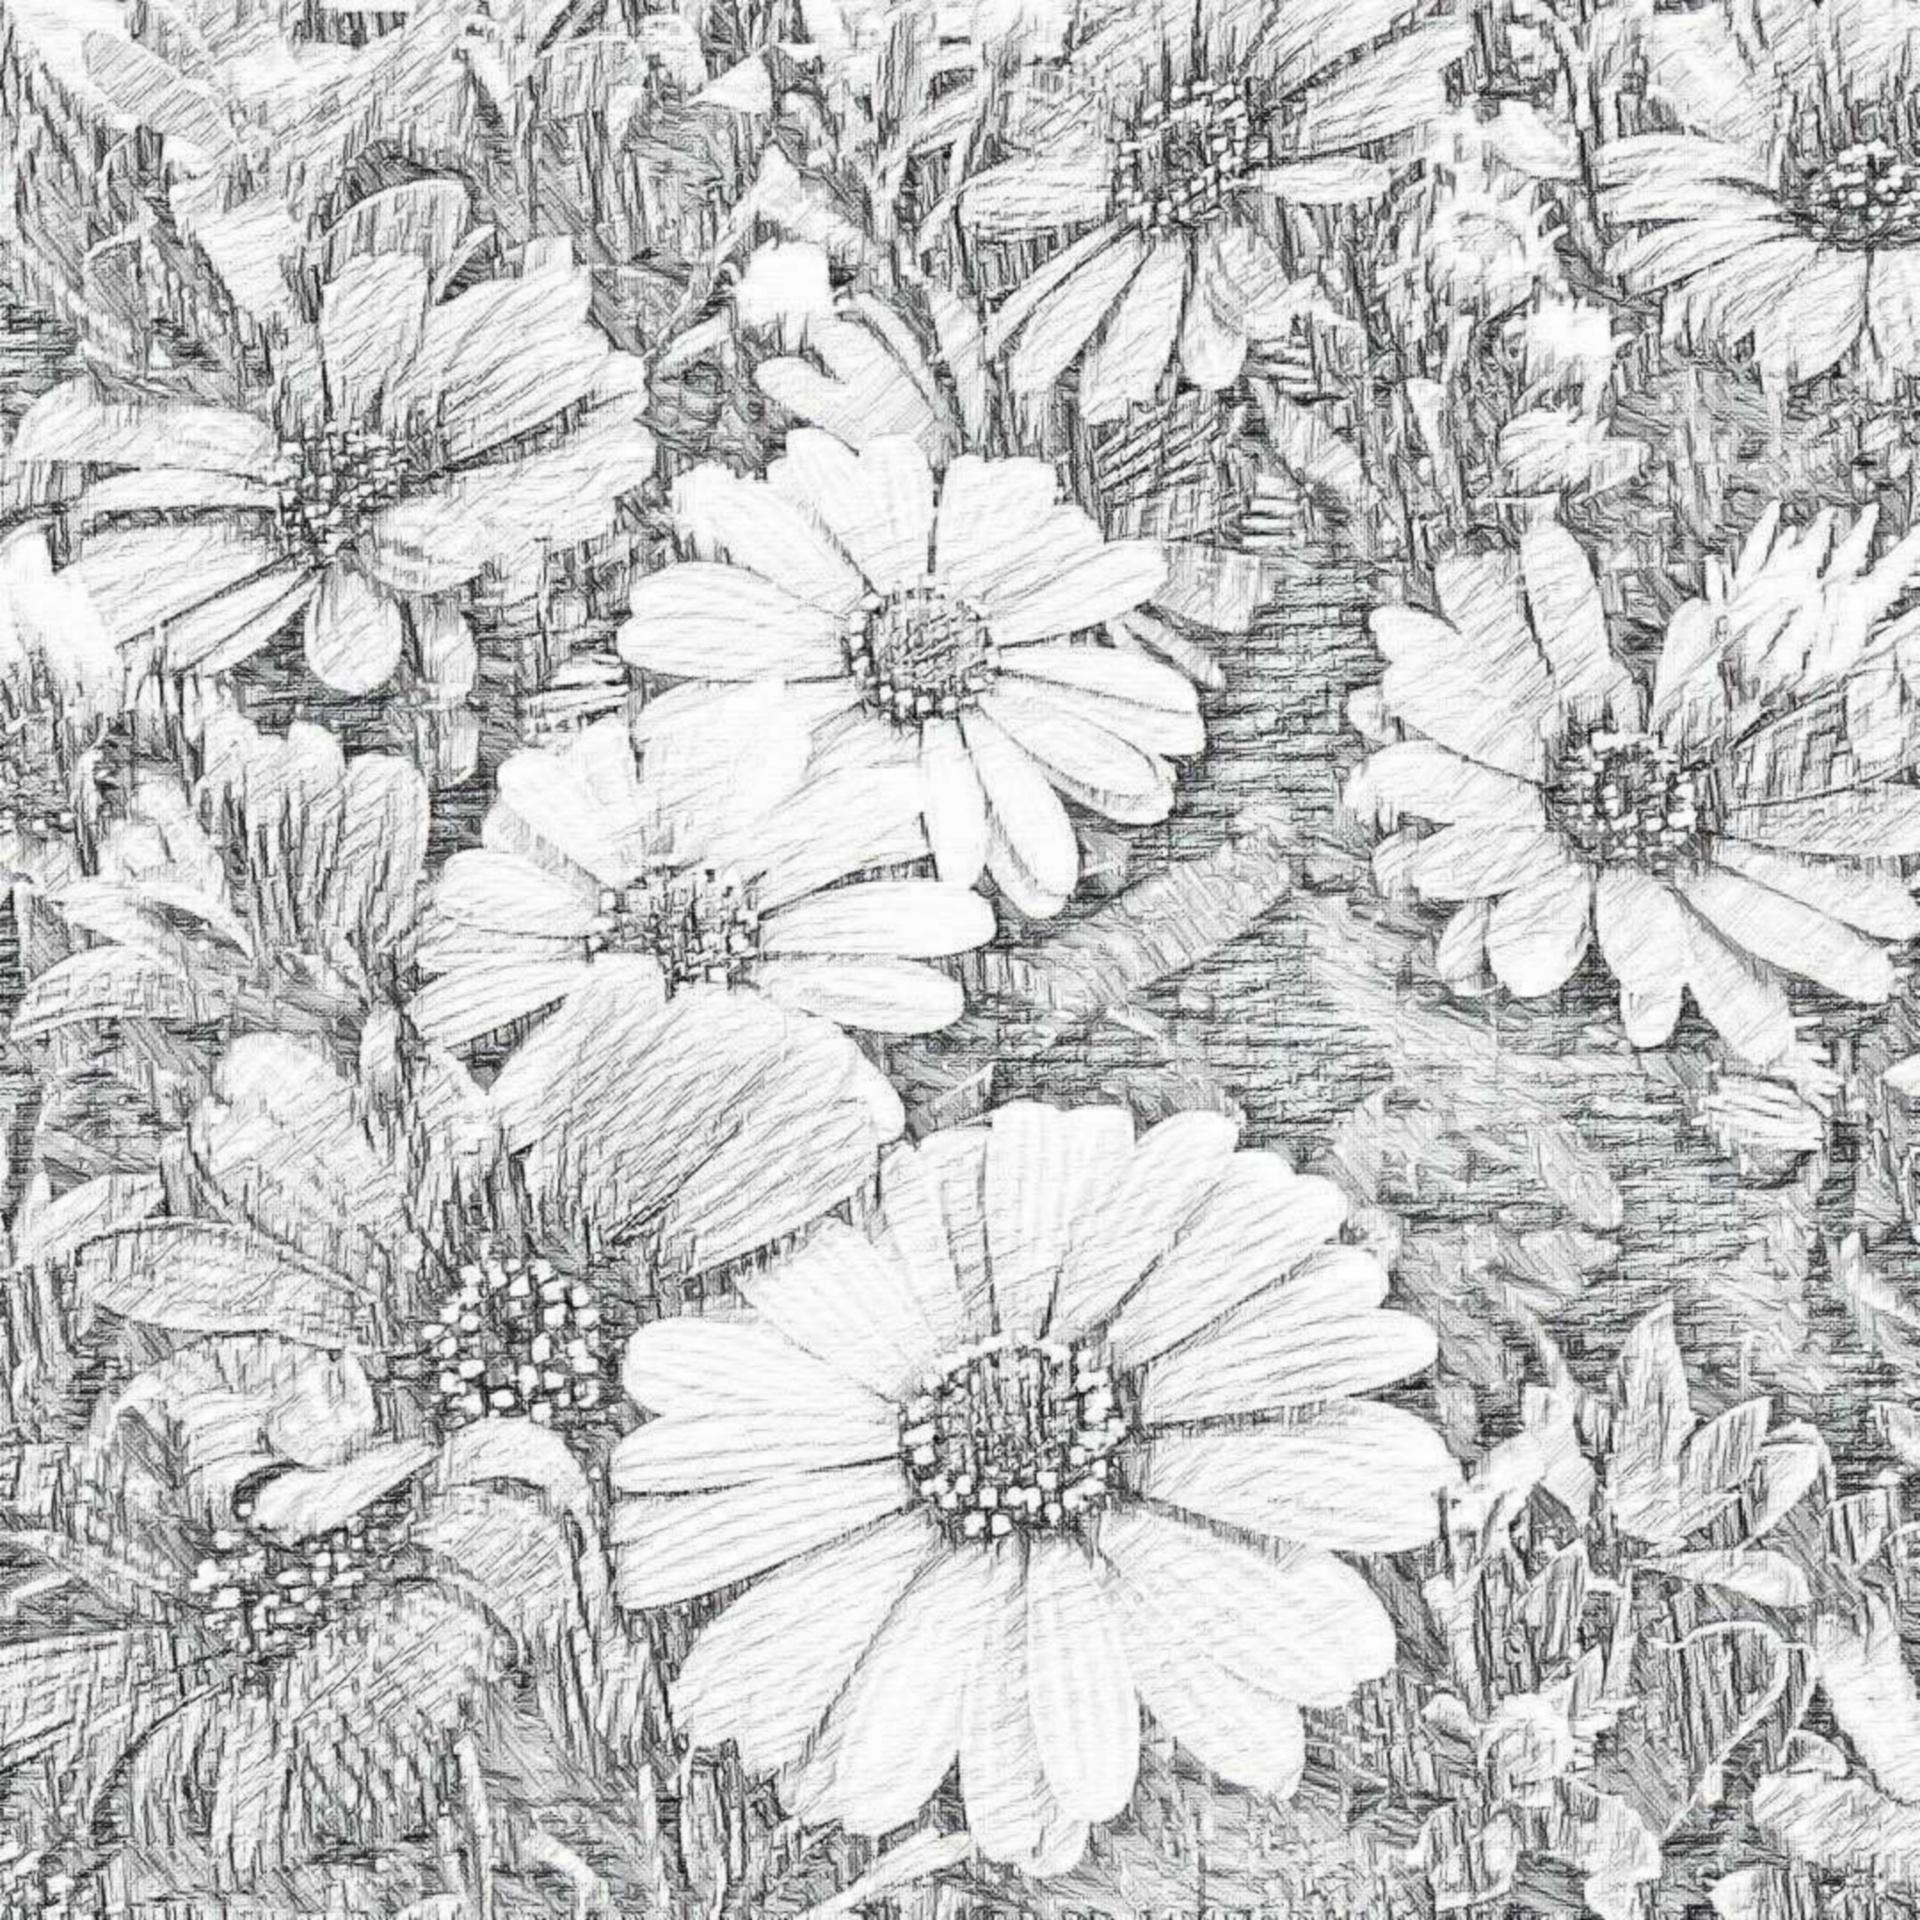 Flowerssketchpencildrawingplants Free Photo From Needpix